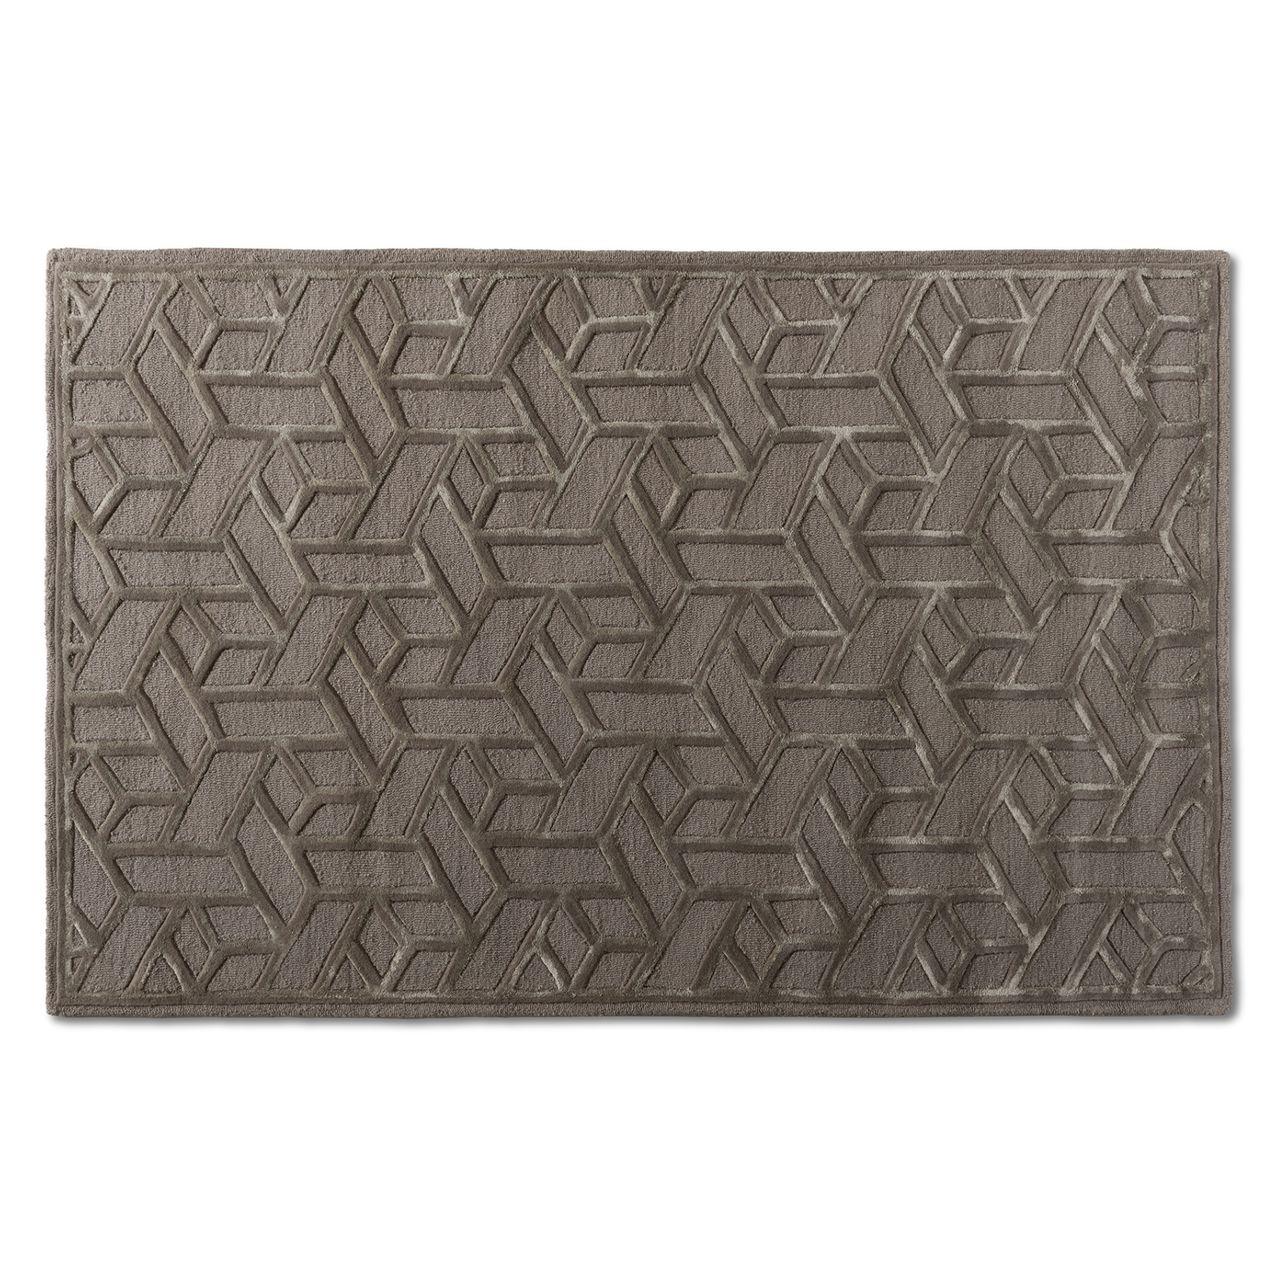 Baxton Studio Vigo Grey Hand-Tufted Wool Blend Area Rug